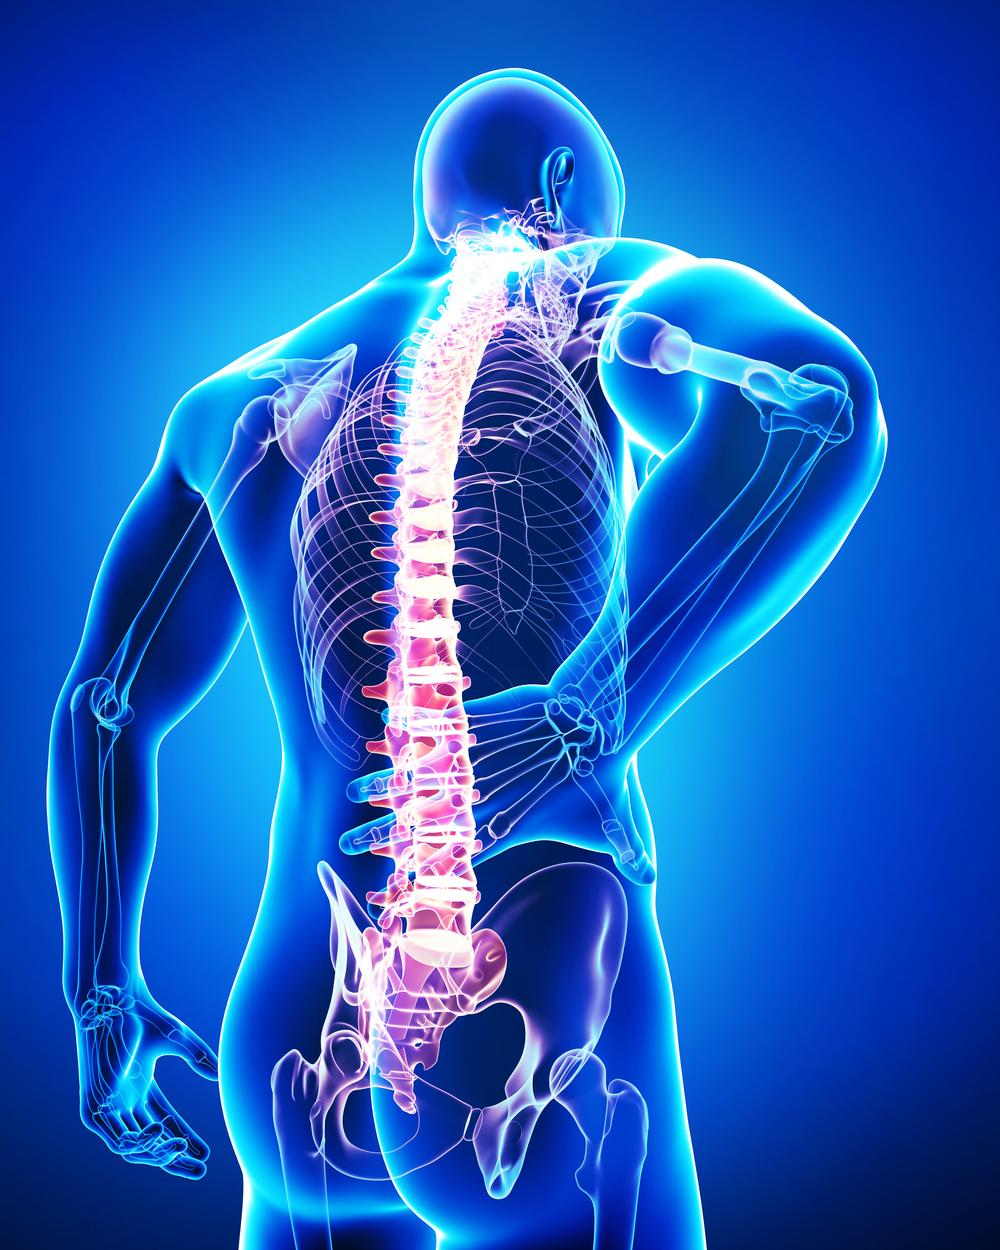 A8_What_Osteopathy_Treats_26852038.jpg